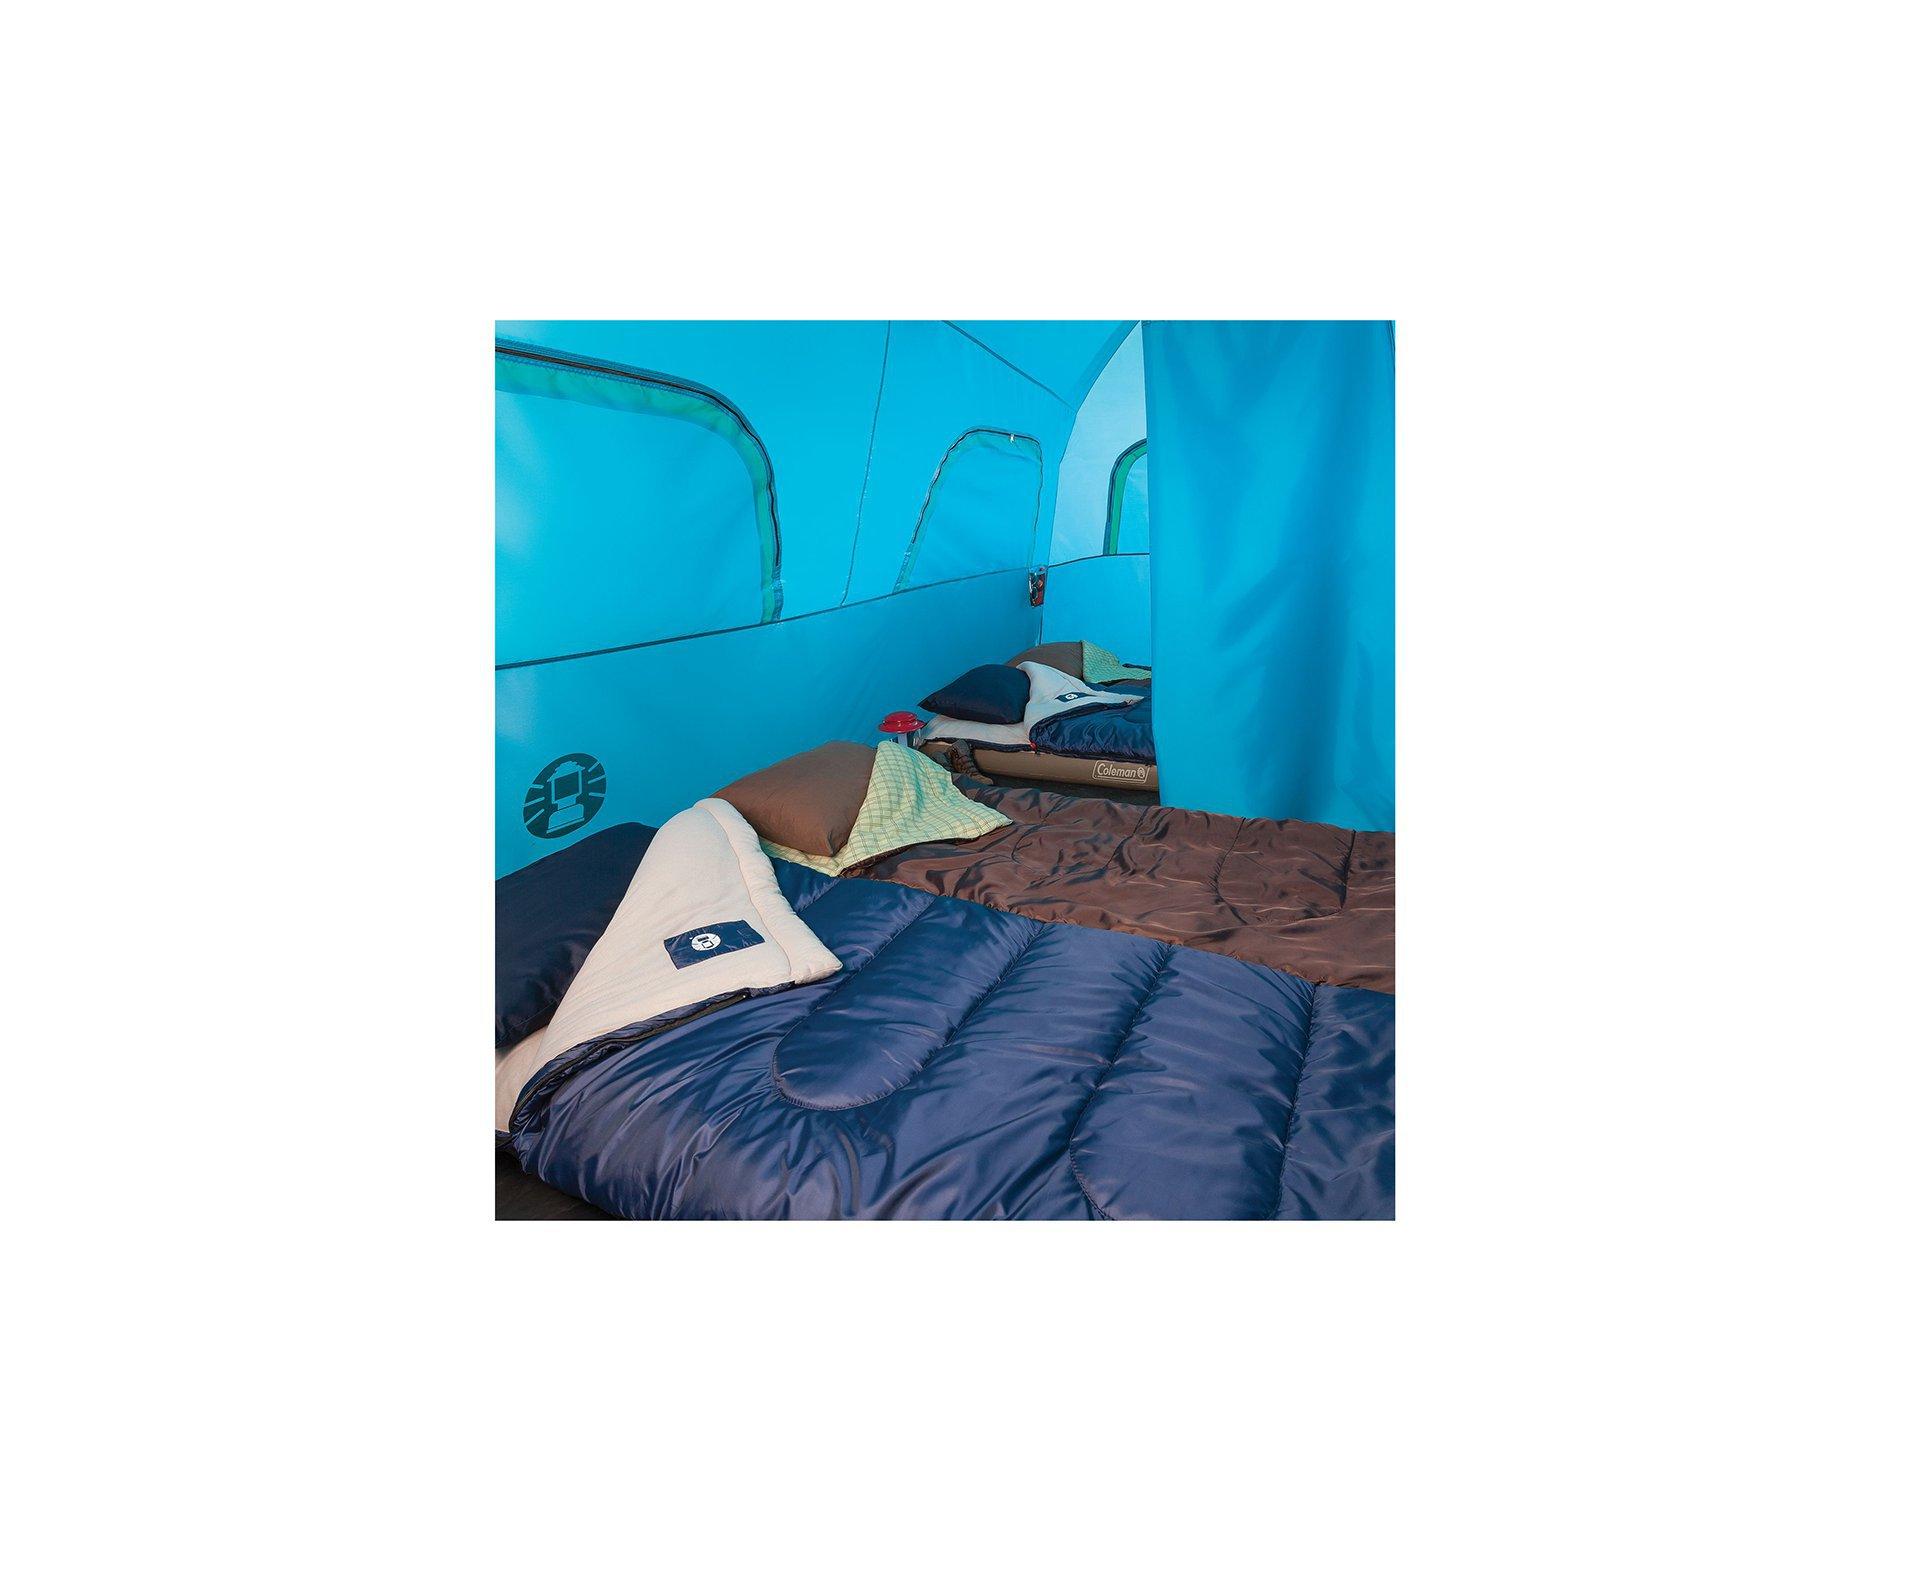 Barraca 8p Signal Mountain  Instant Tent 2000mm Coluna D água - Coleman